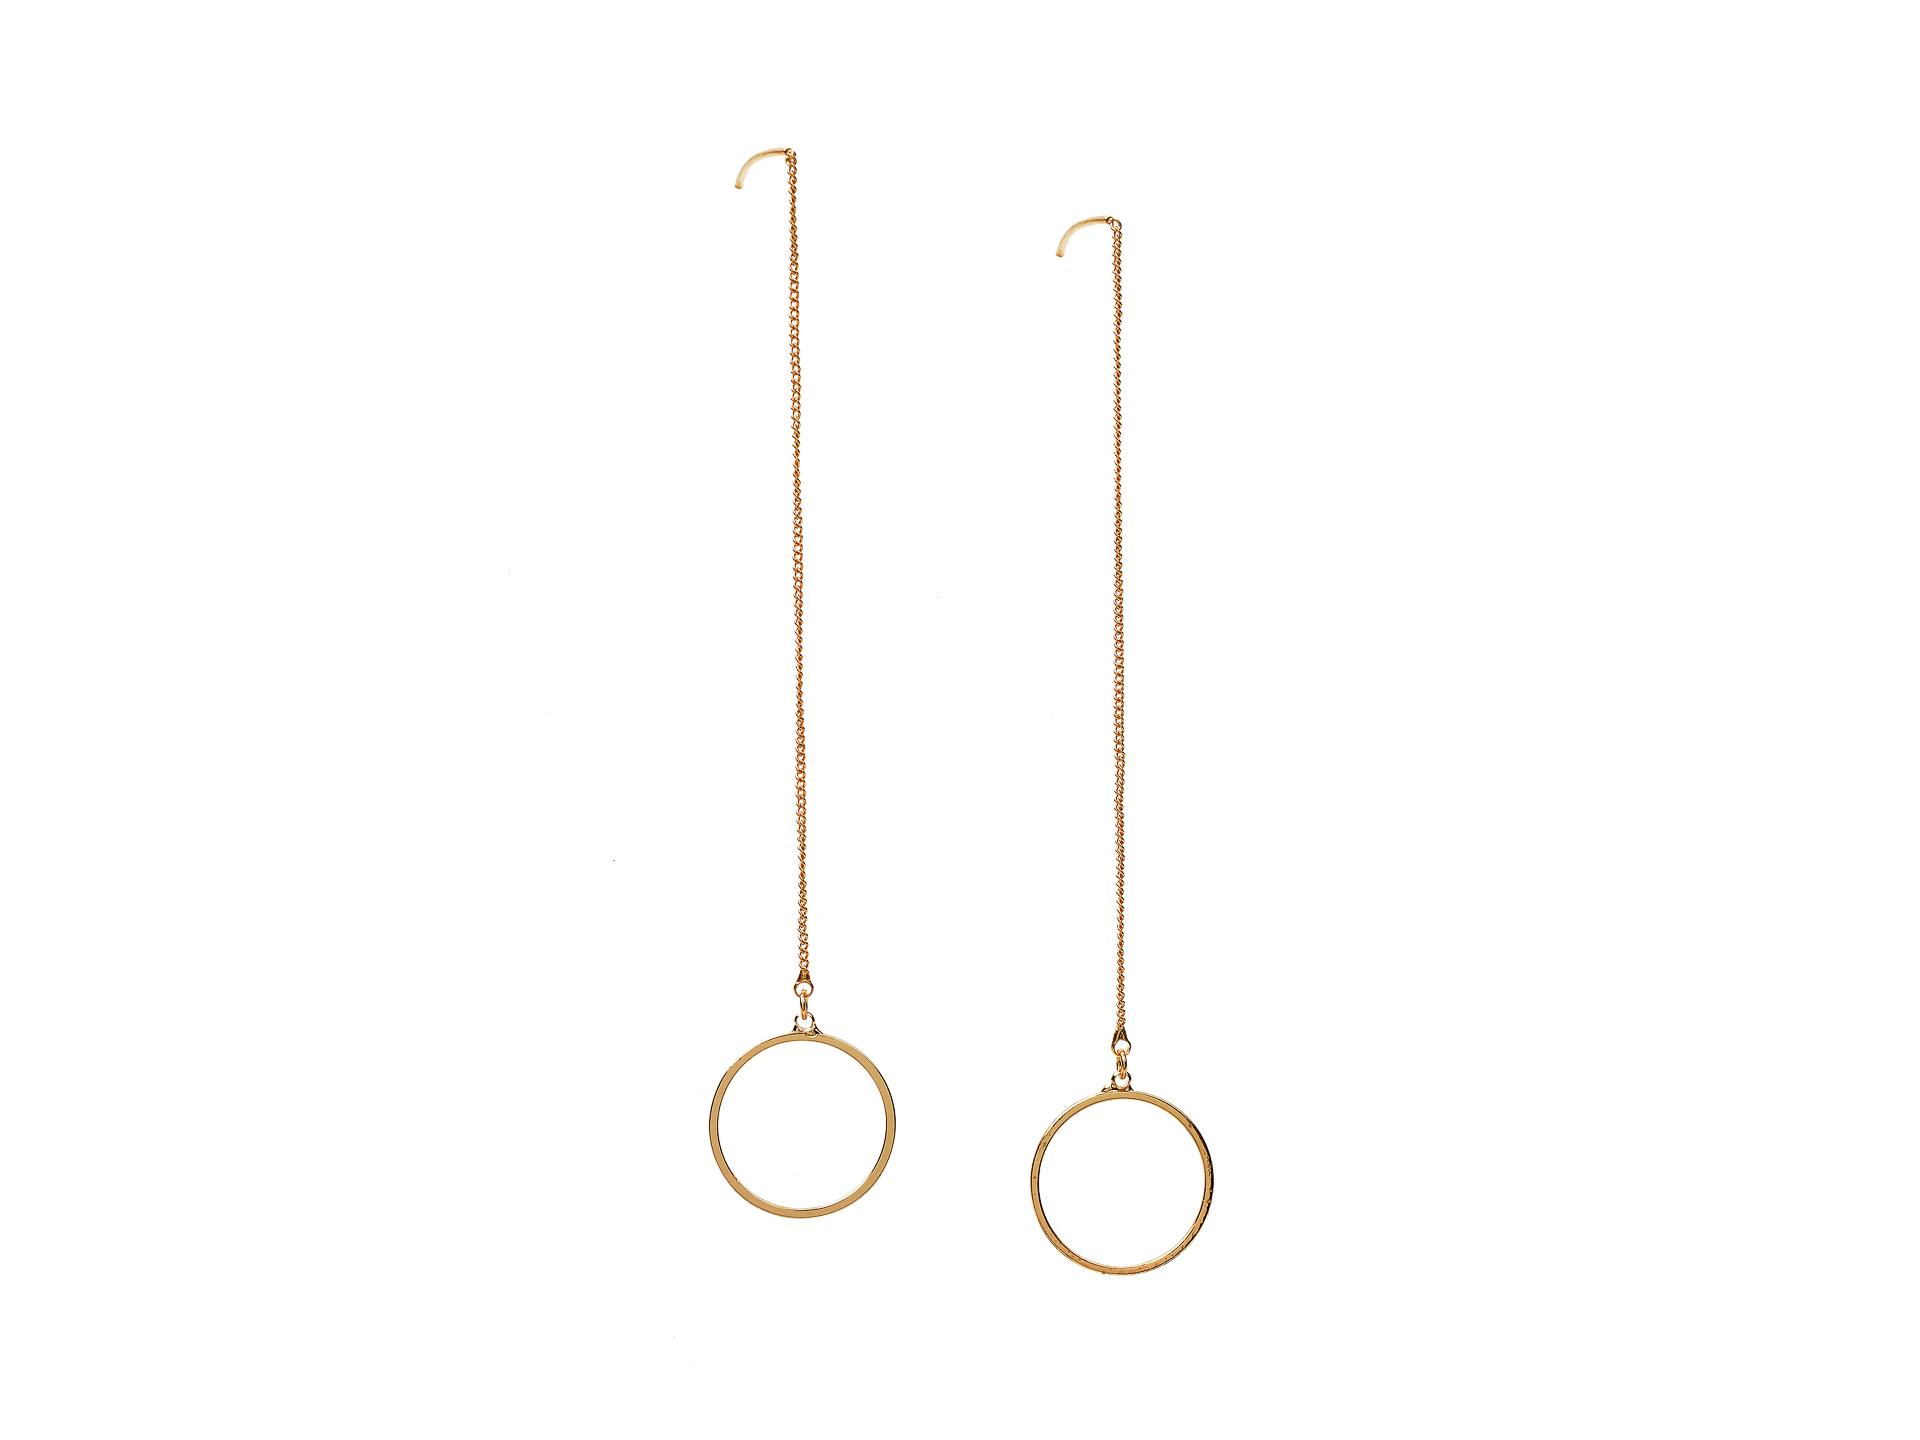 Cercei ALDO aurii, Rostagni710, din metal New